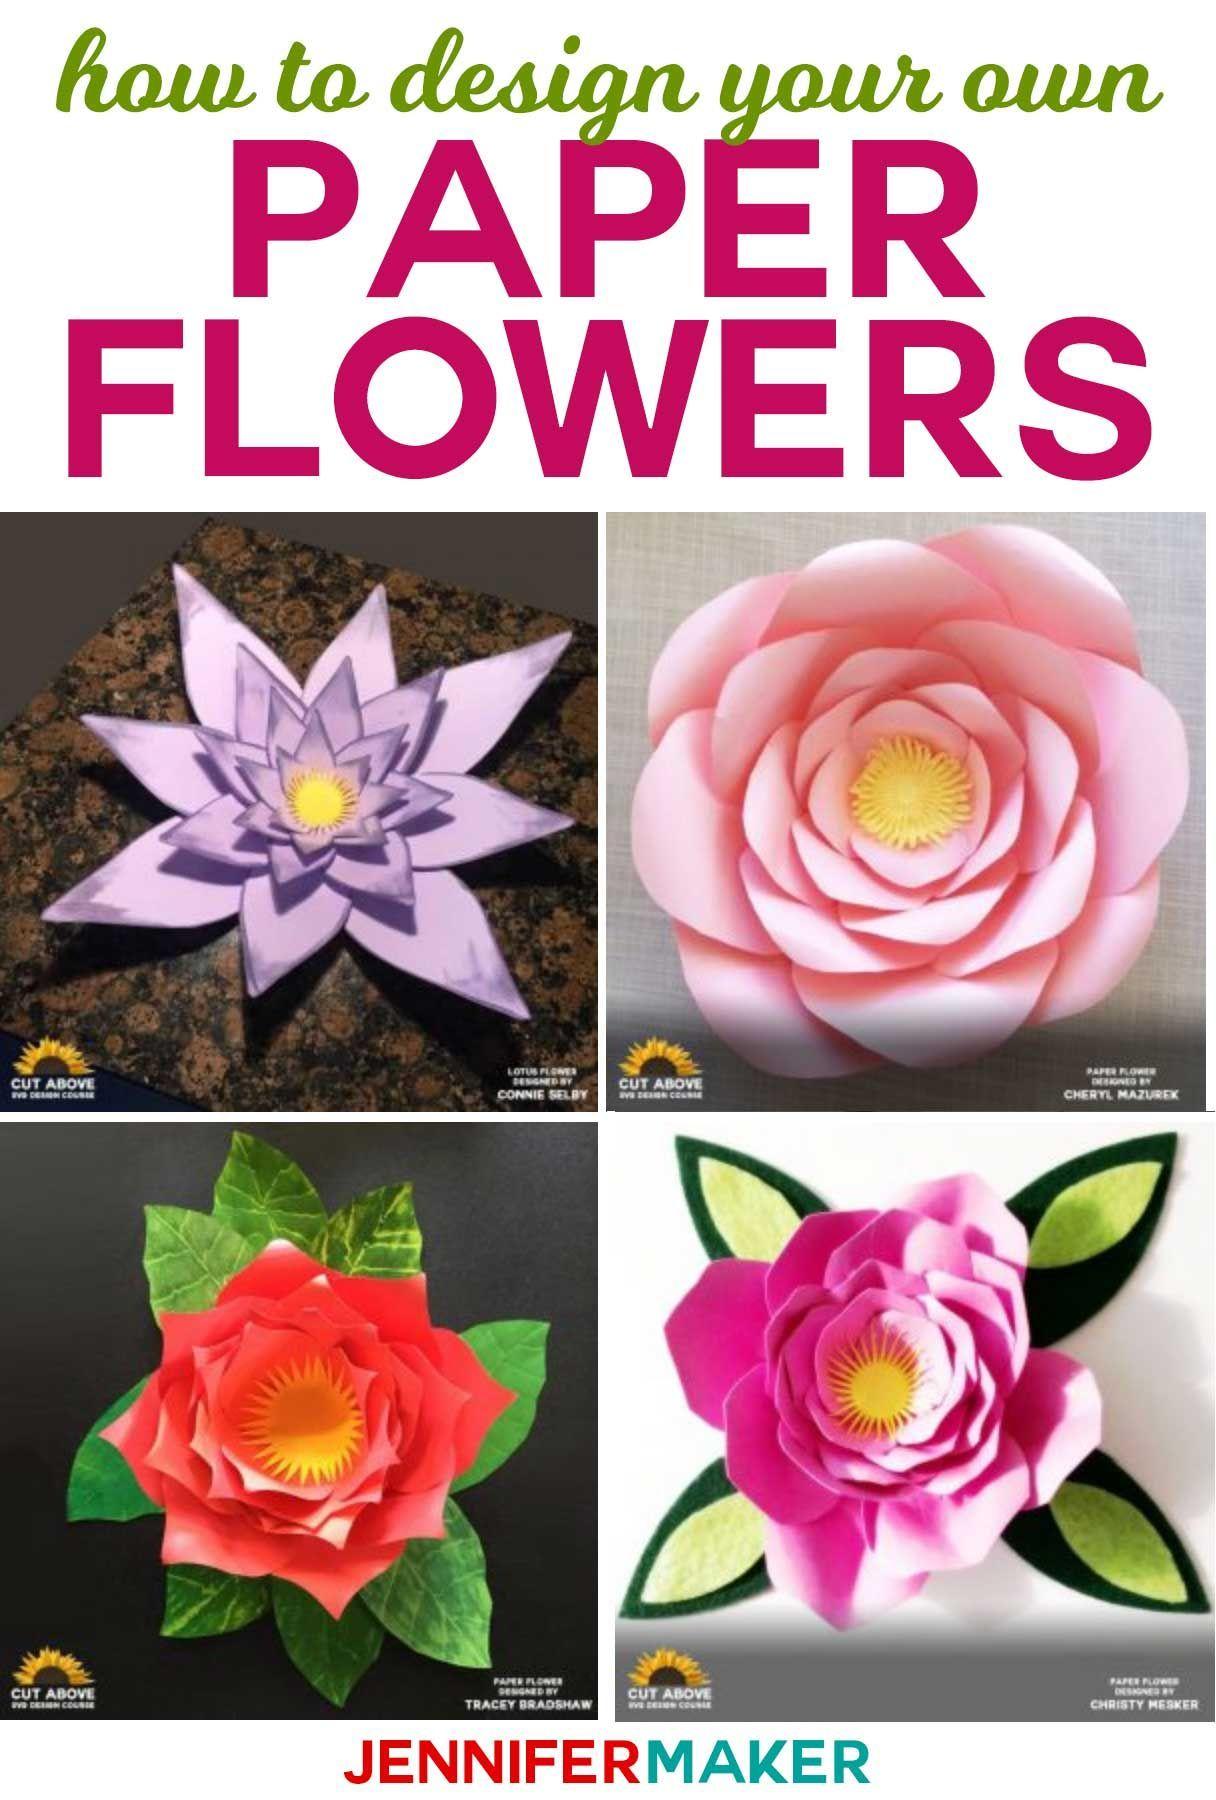 Paper Flower Designs That Will Blow You Away Flor Pinterest